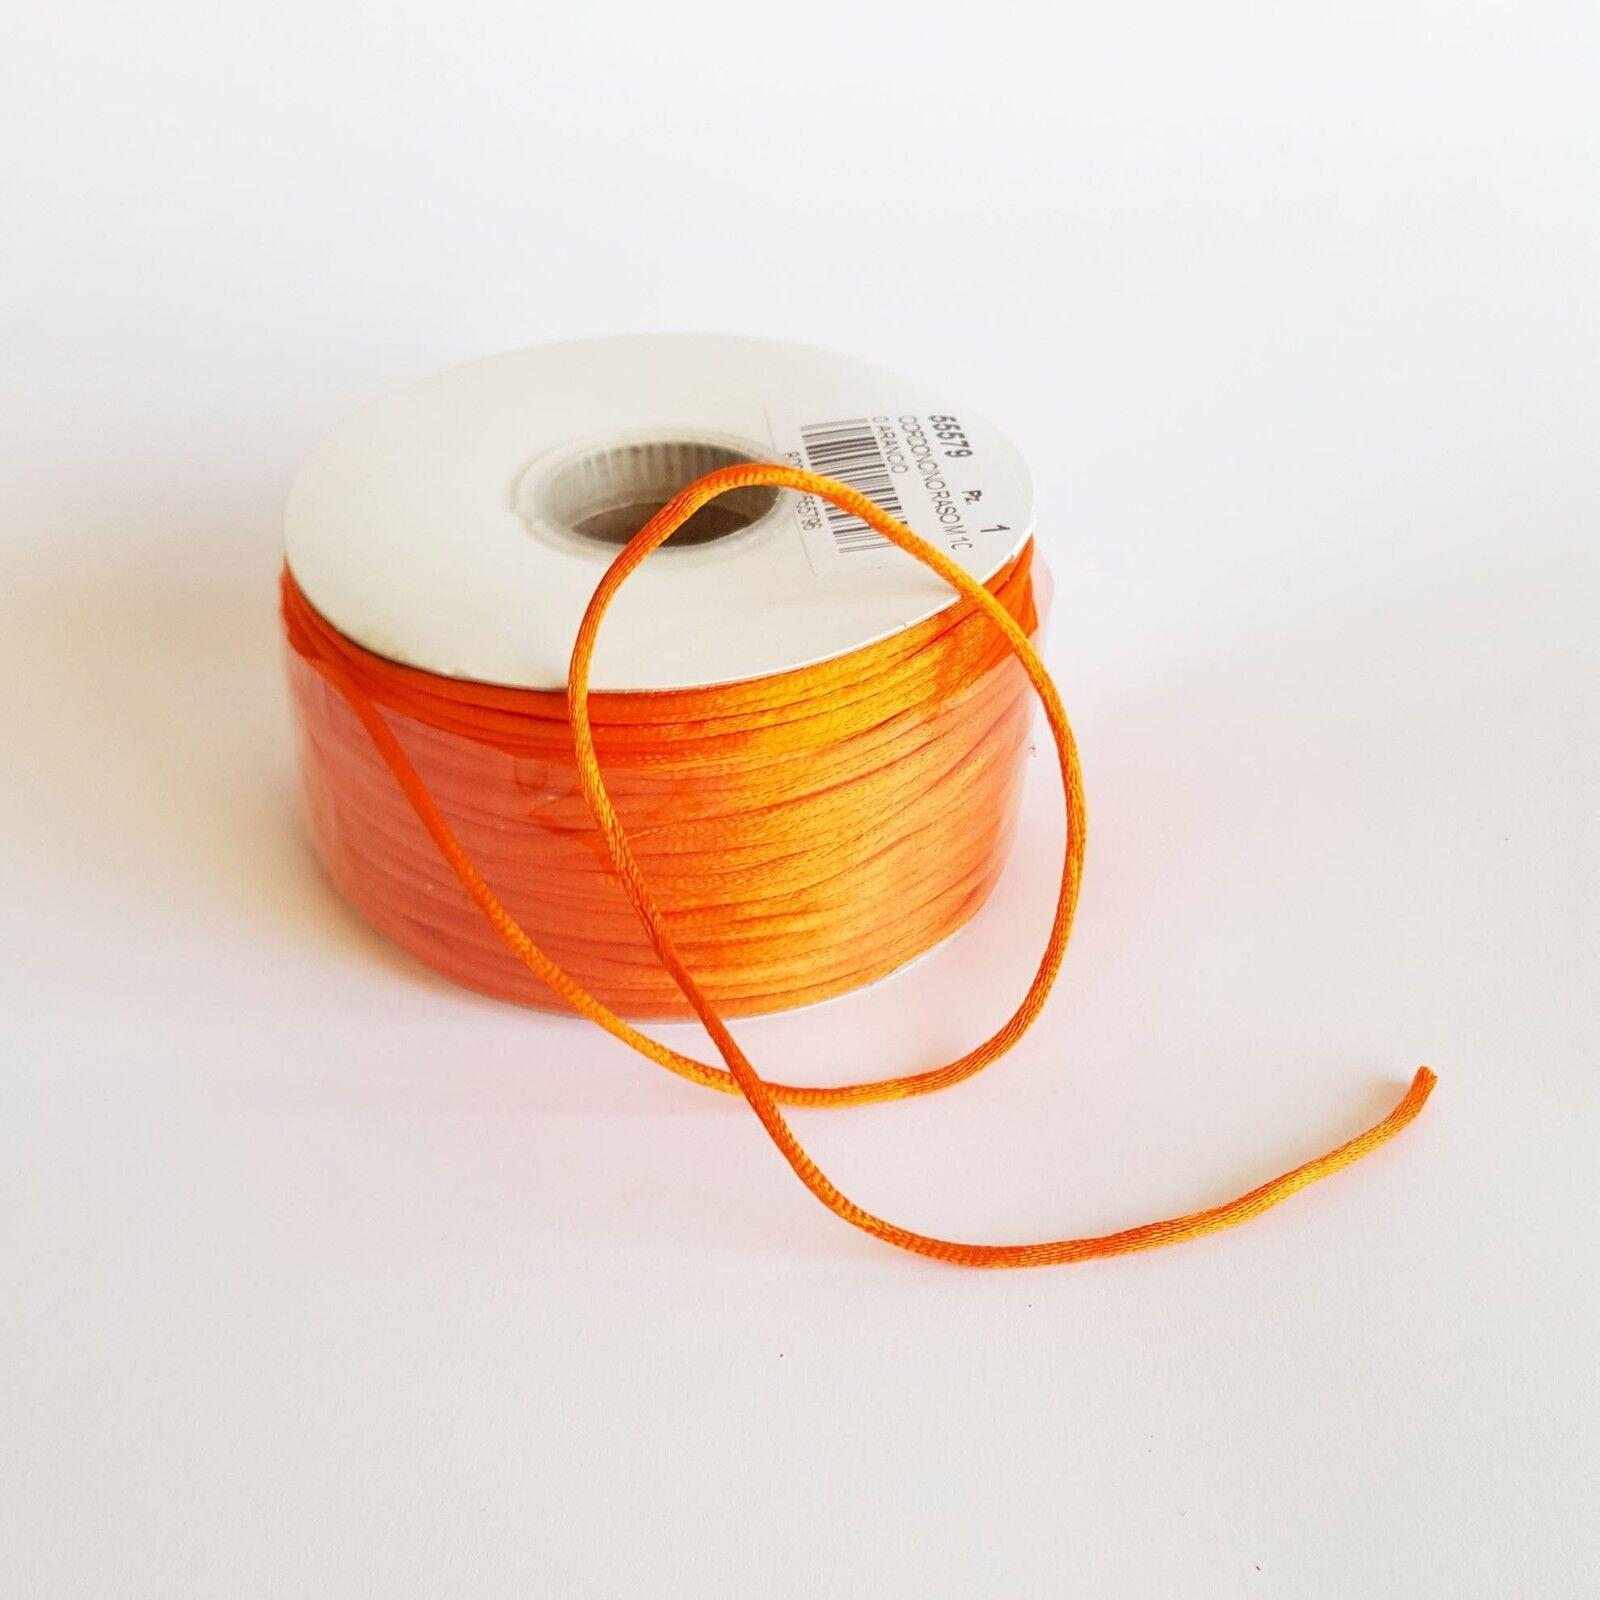 Cordoncino raso 10 mm rougeolo bobina 100 mt Arancione  D 2 mm  -art 55579